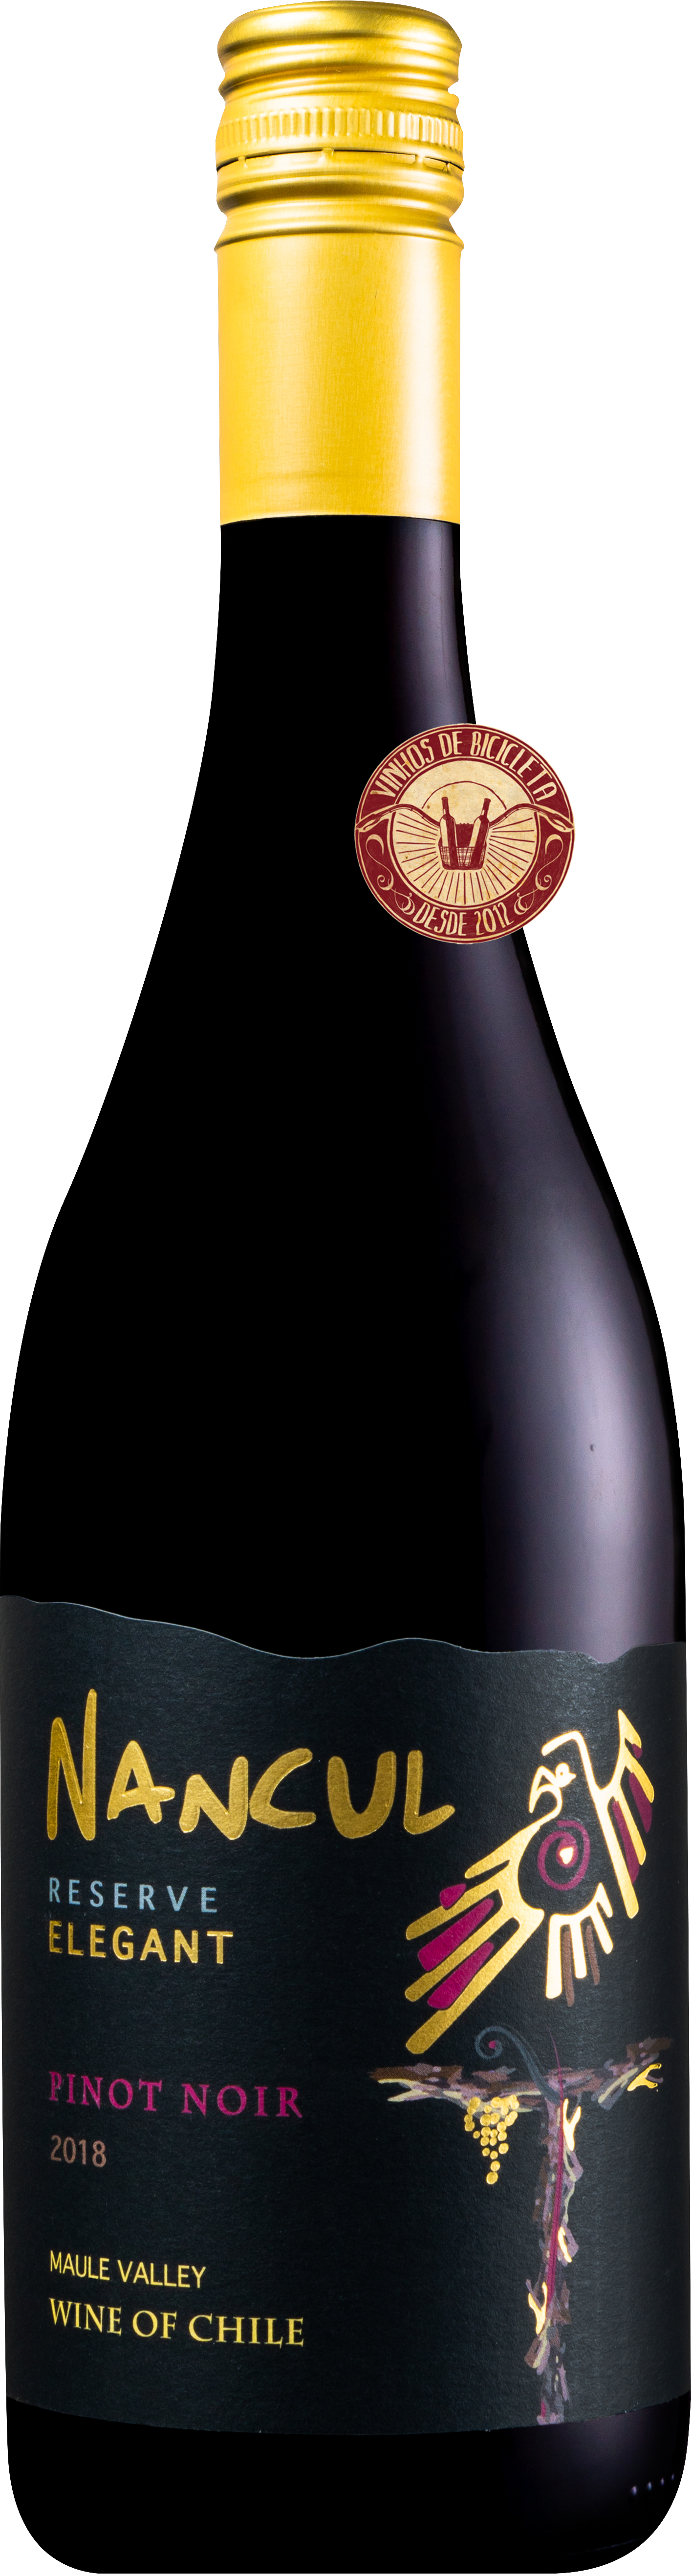 Nancul Reserve Elegant Pinot Noir